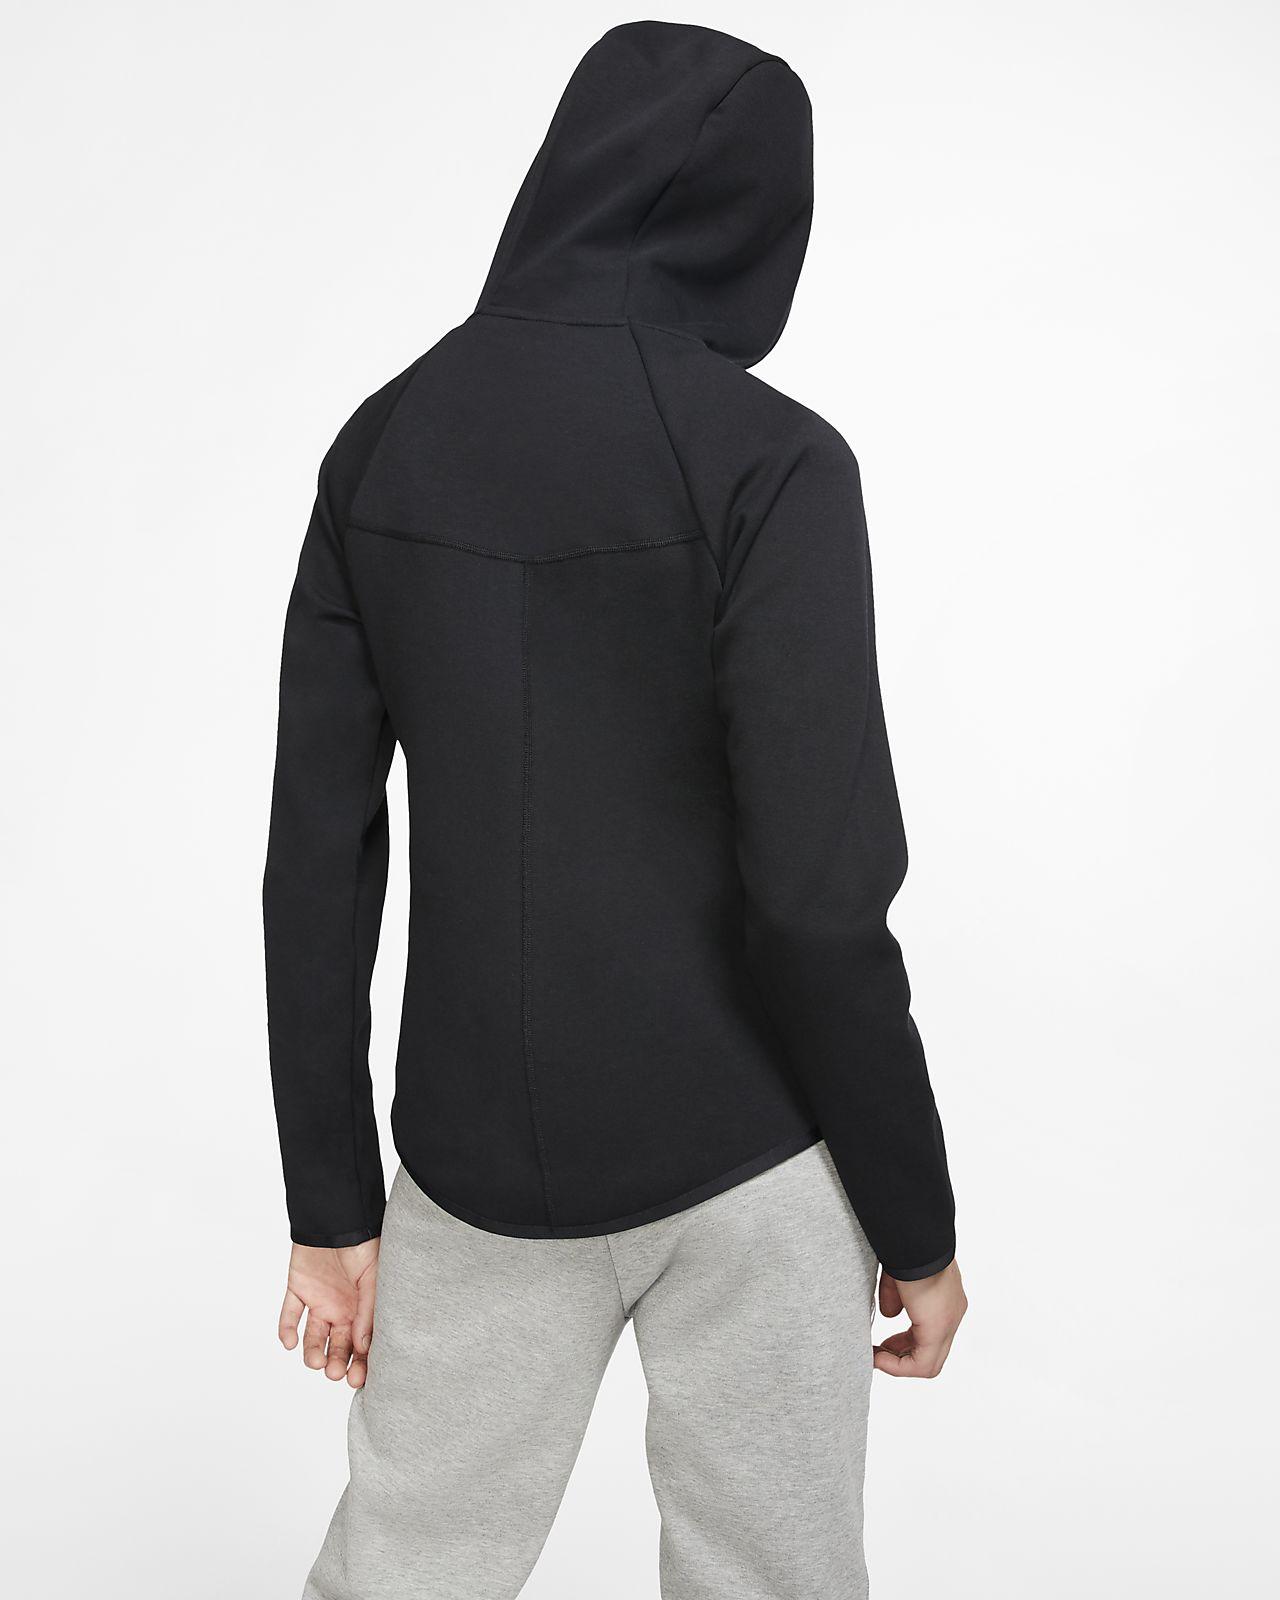 Nike Tech Fleece Windrunner Hoodie Black Black